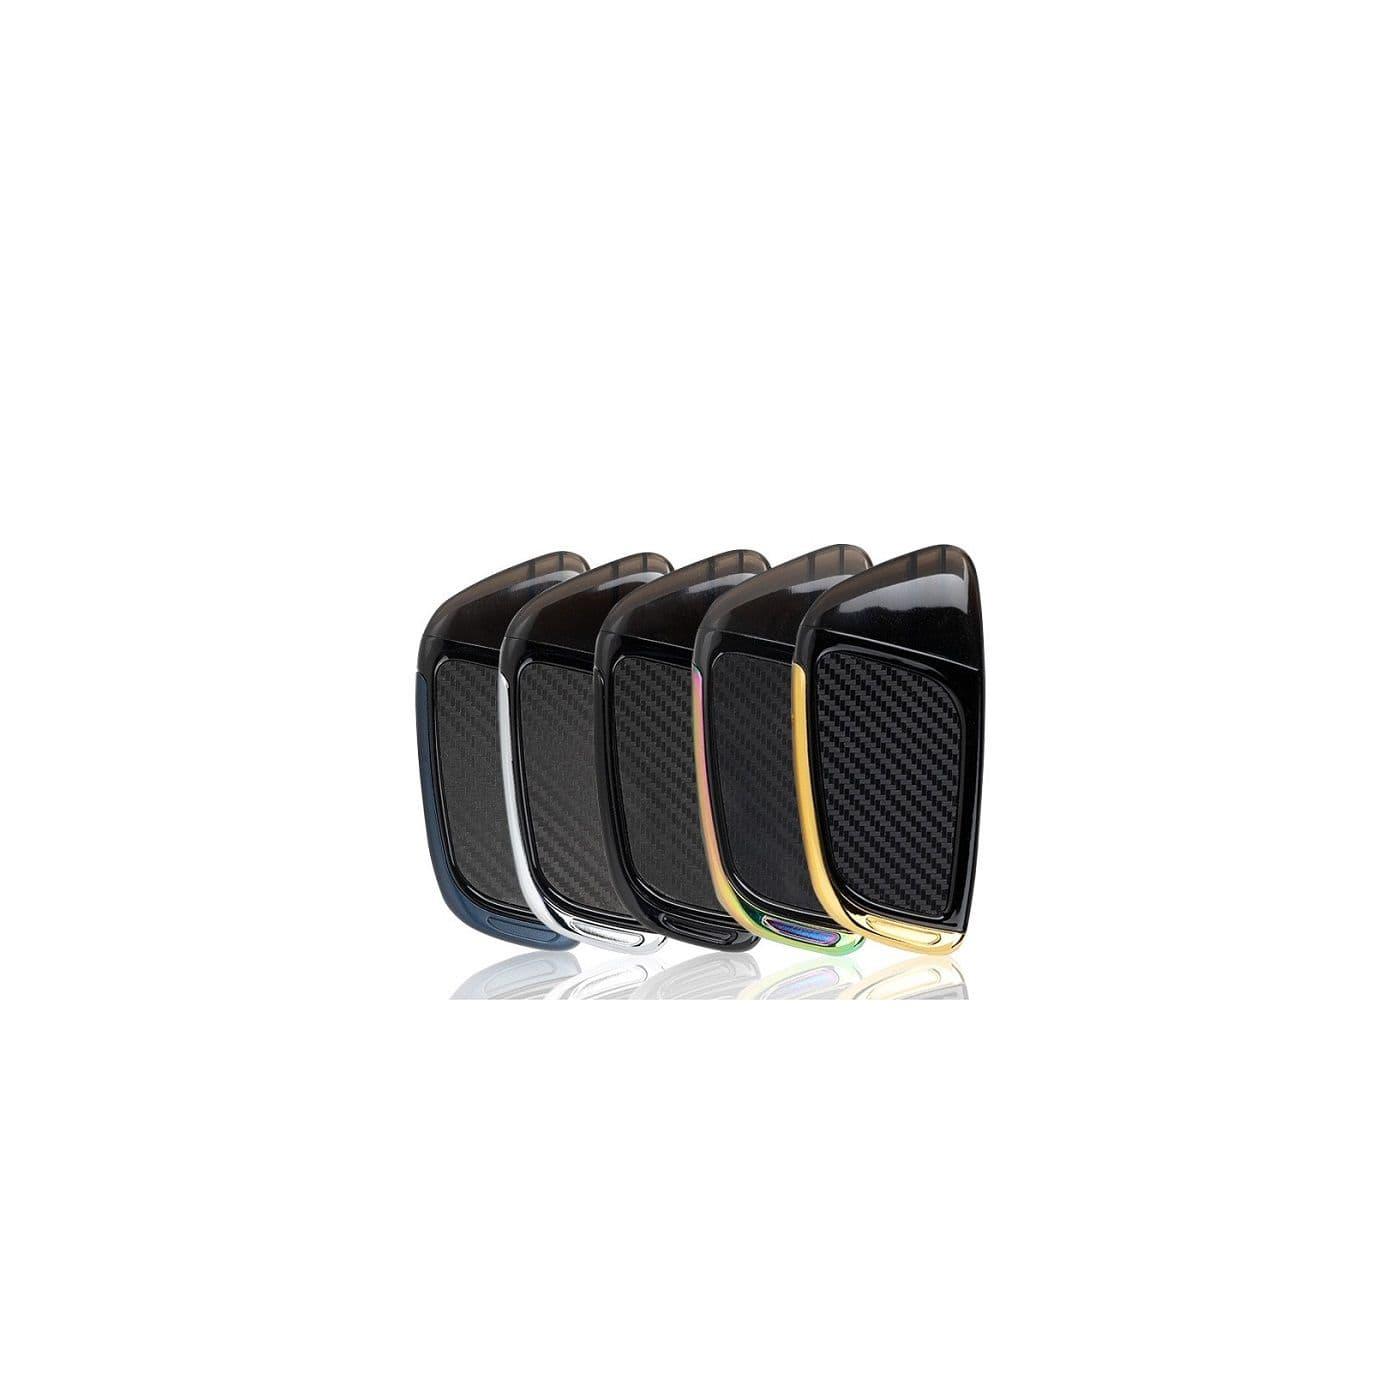 Rincoe Ceto Pod System Kit